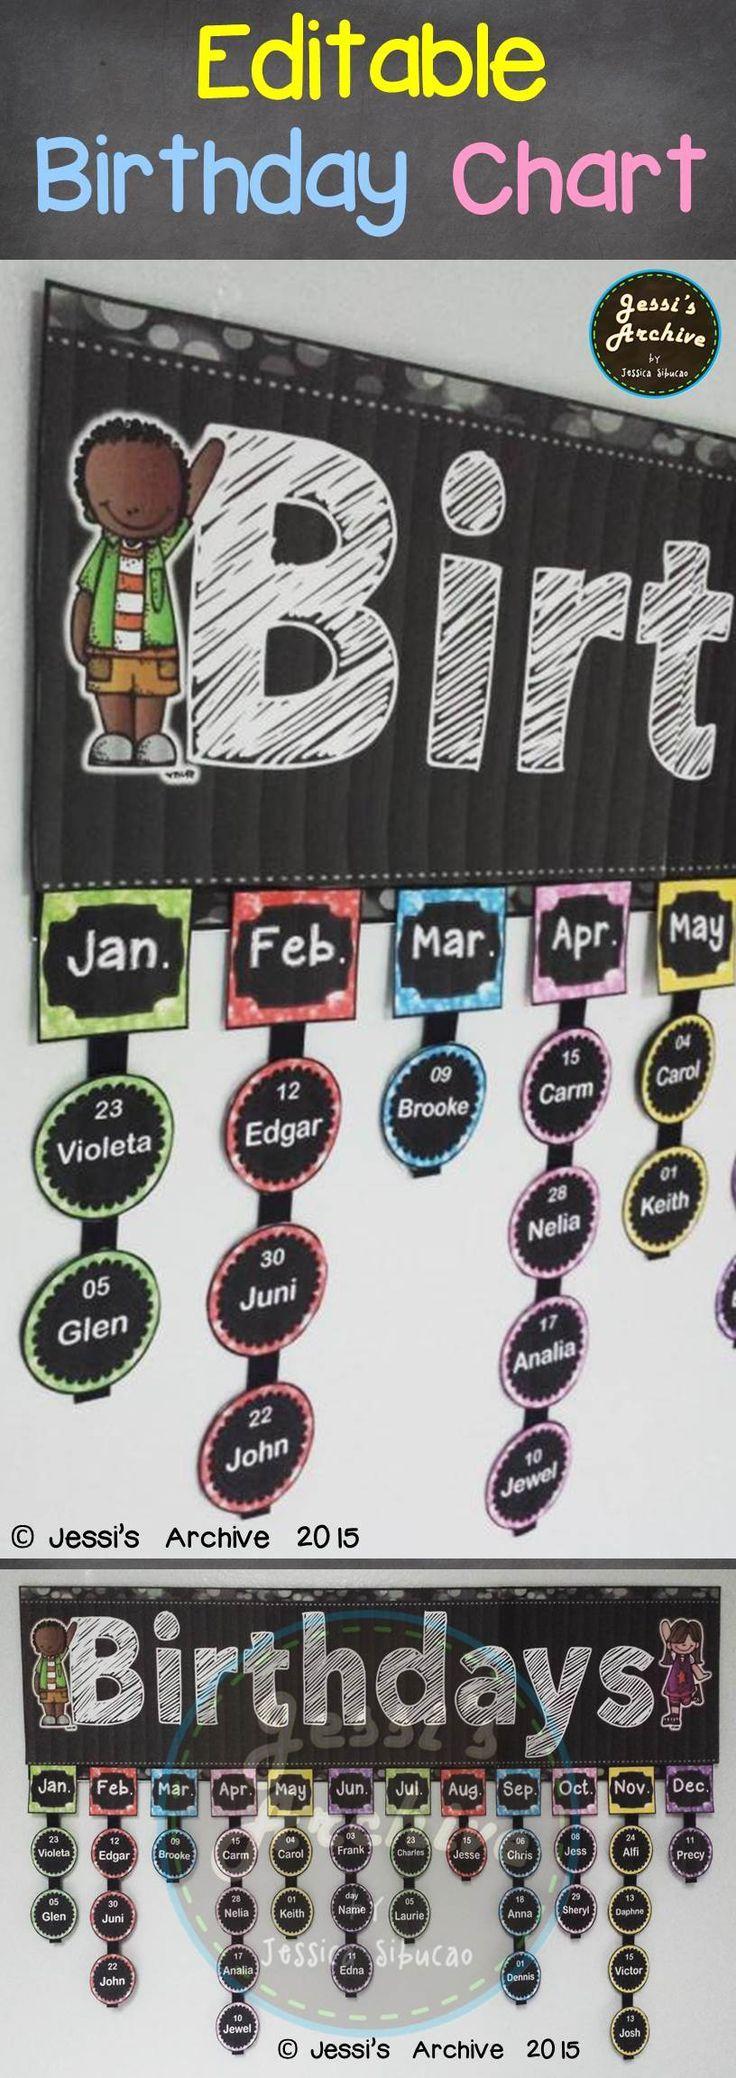 Birthday Chart Birthday Board Classroom Classroom Birthday Birthday Charts